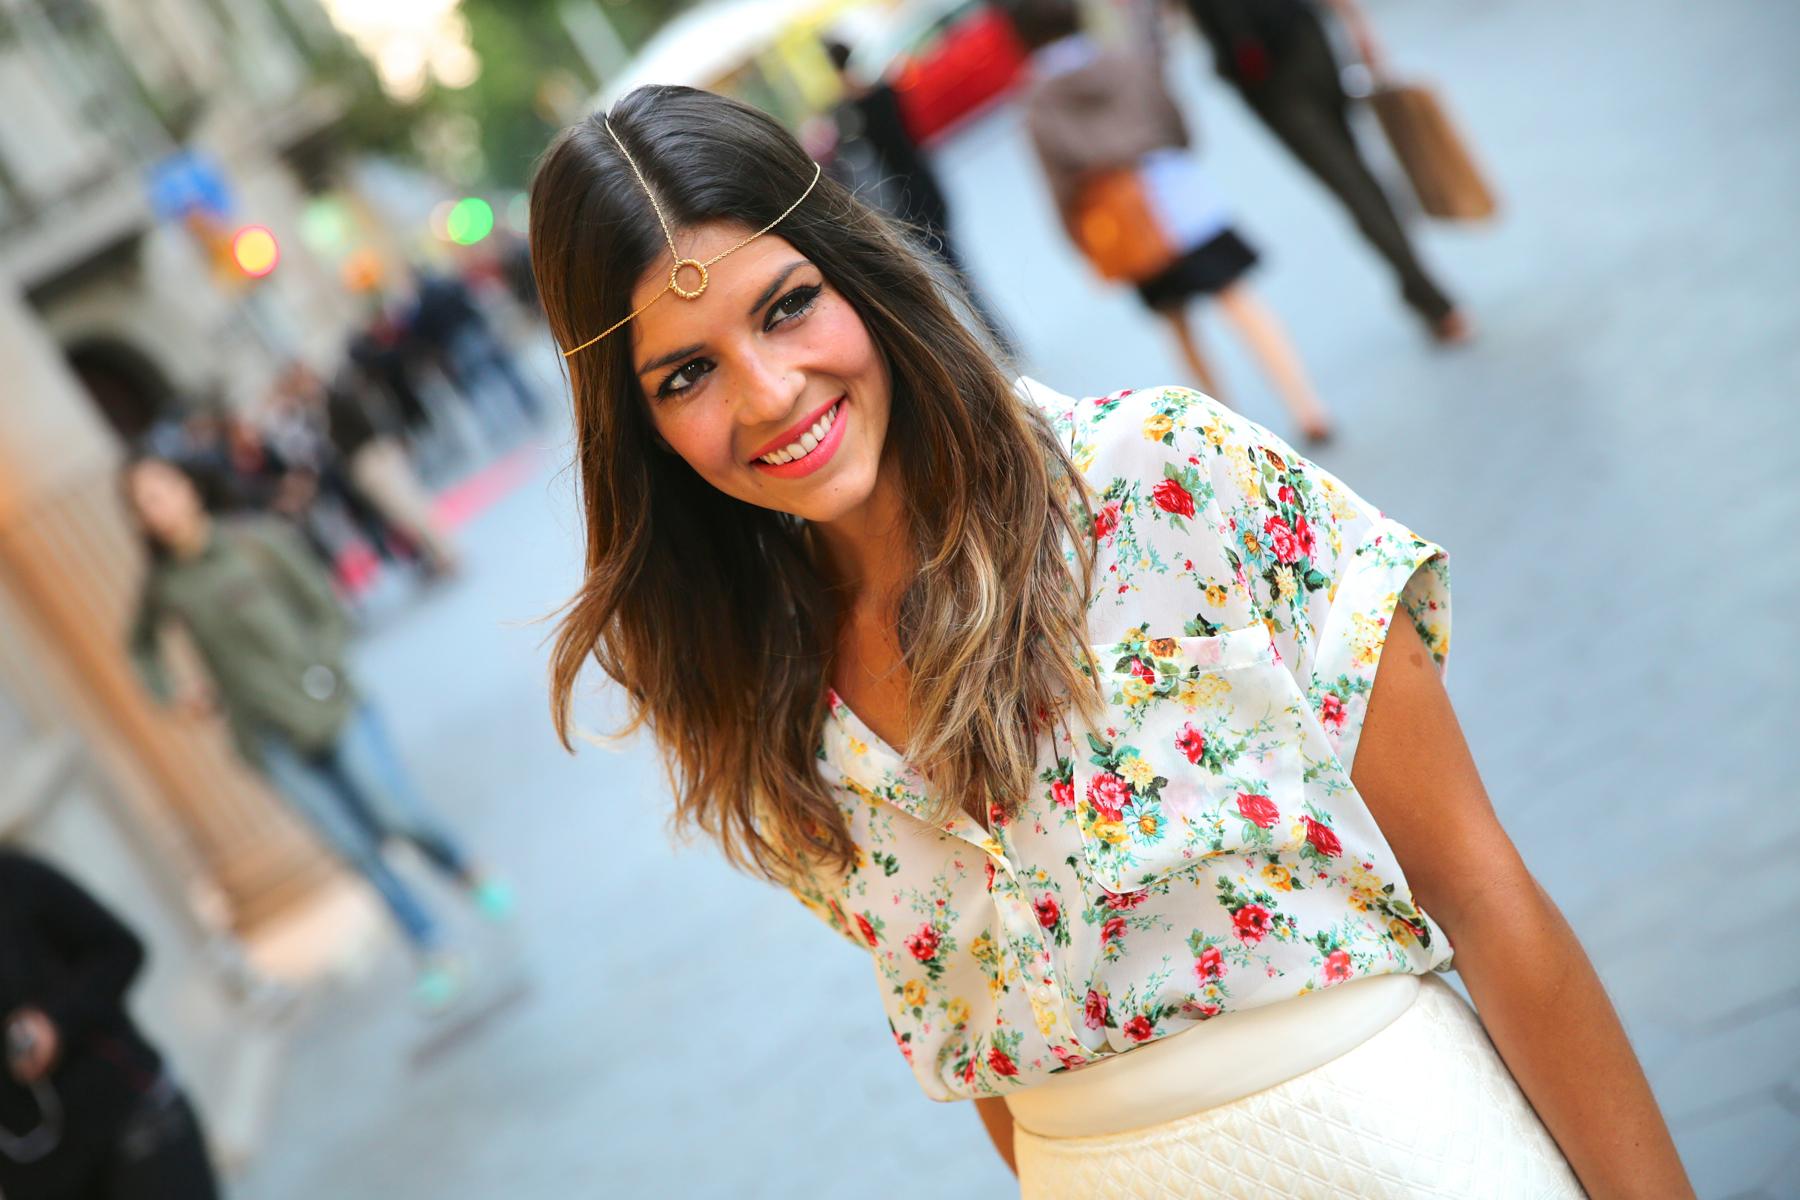 trendy_taste-look-outfit-hotel_majestic-street_style-ootd-blog-blogger-fashion_spain-moda_españa-falda_flecos-fringes_skirt-mas34-mango-blusa_flores-primaver_verano-zapatos_naranjas-tocado_dorado-4